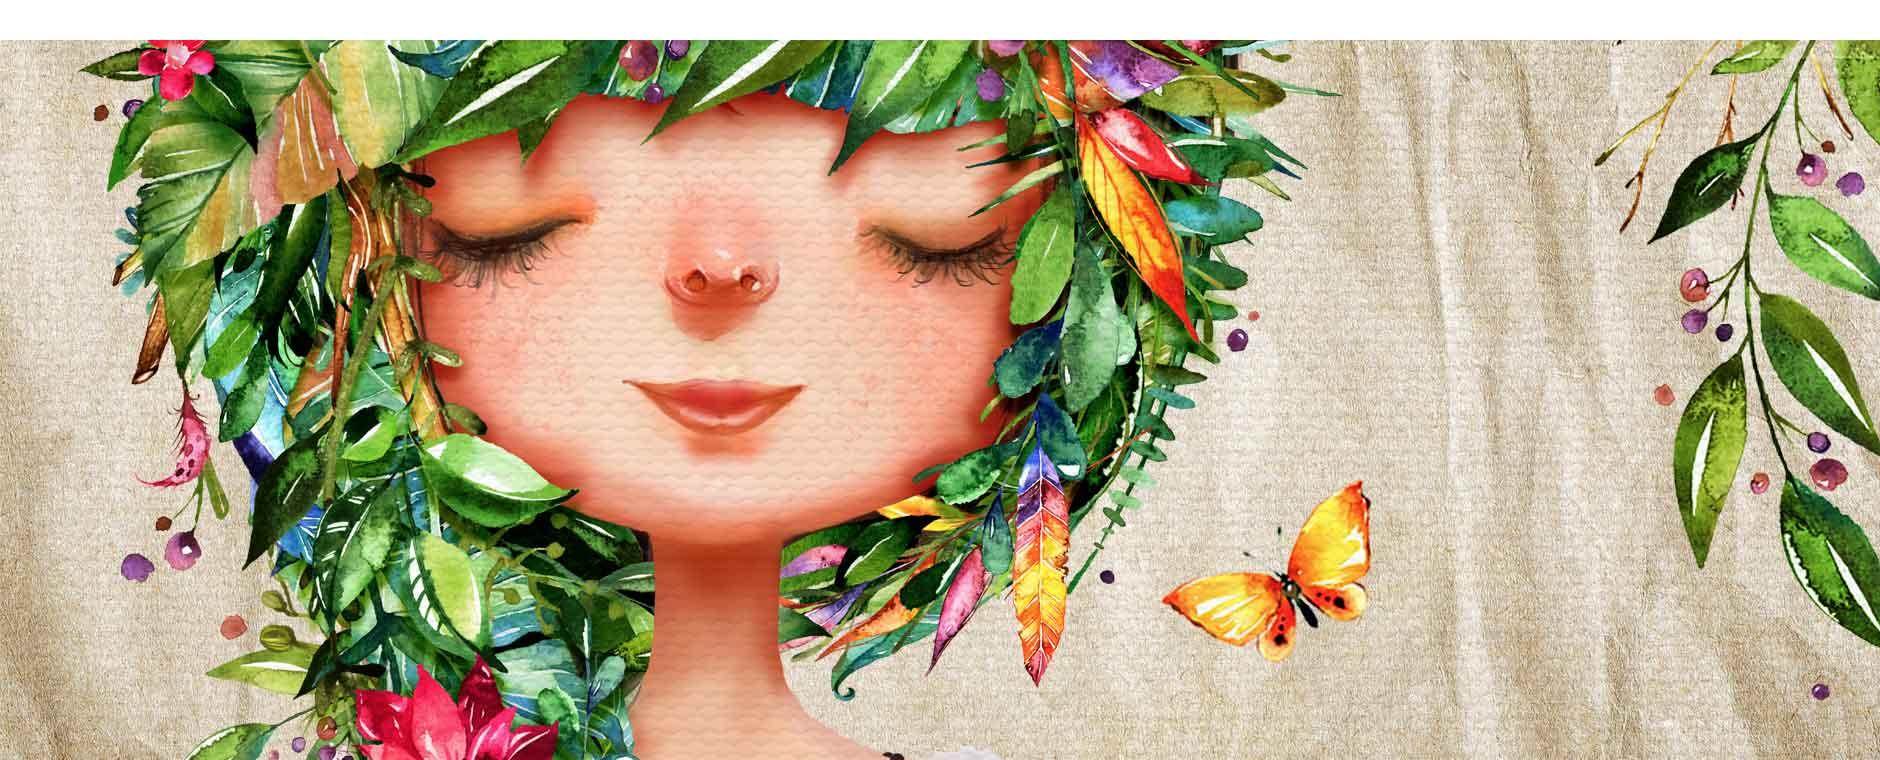 slider_studio_draak_postkaarten_femmes_floral_postcrossing